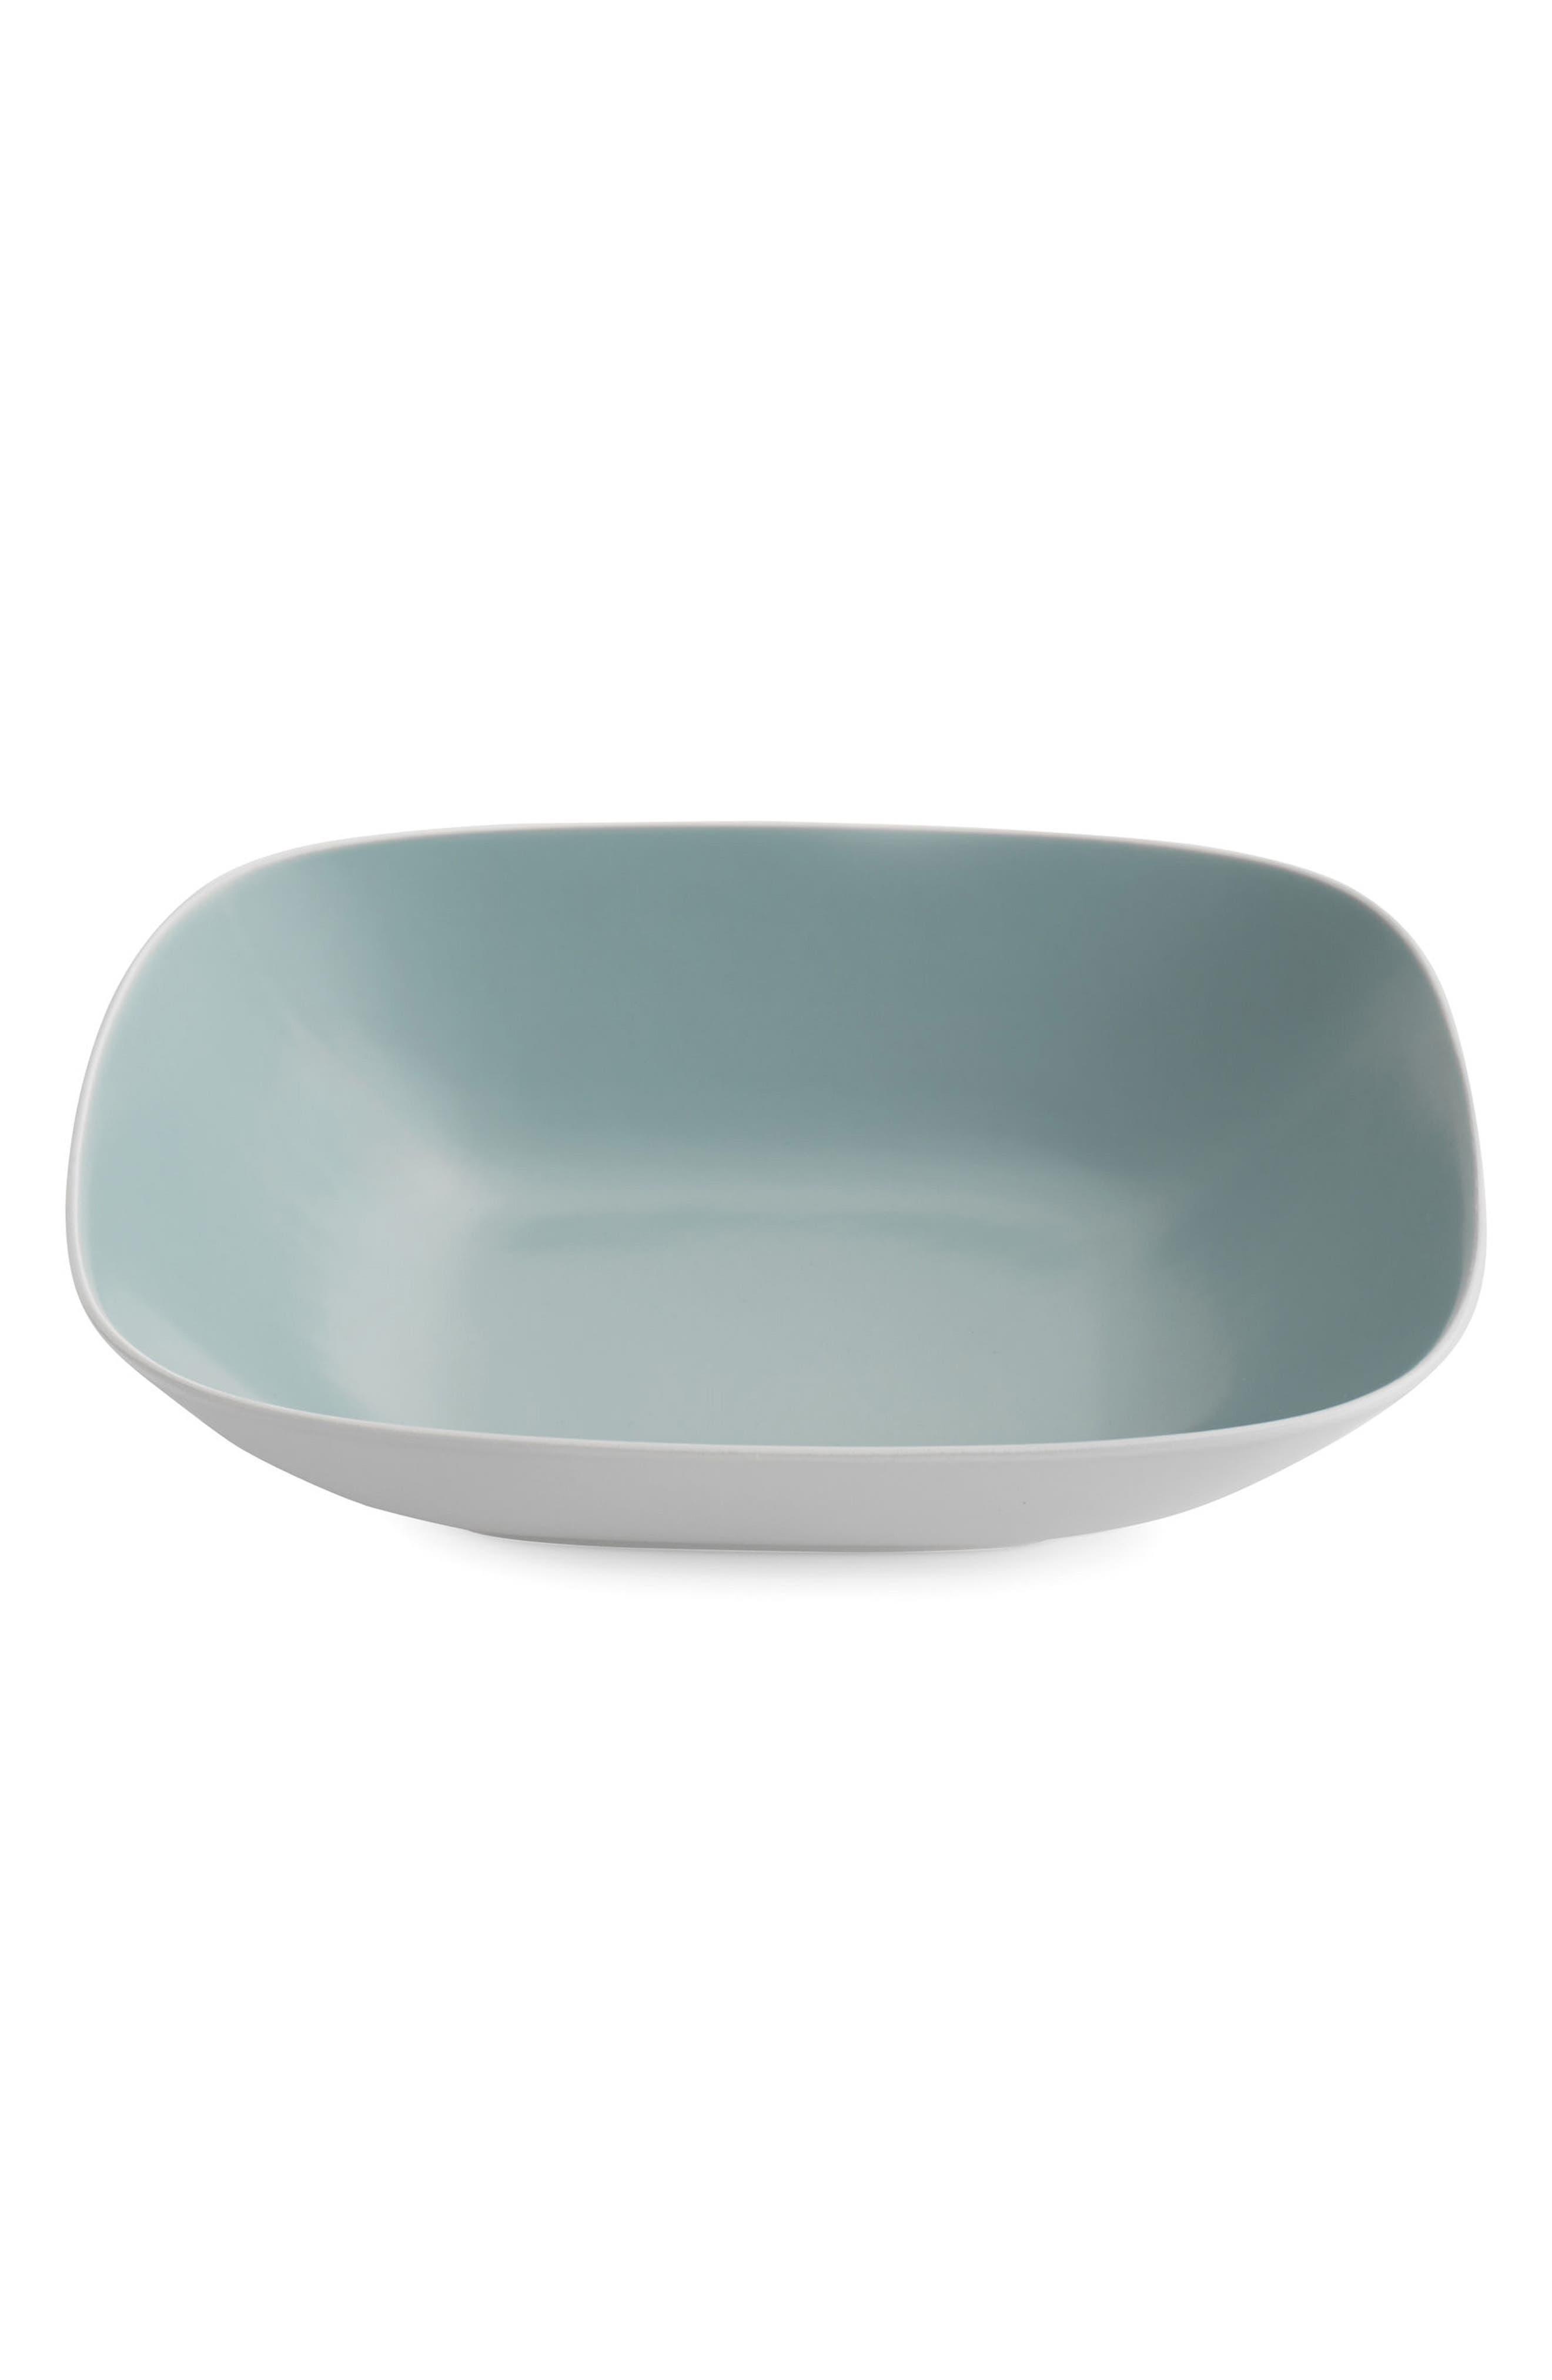 POP Square Serving Bowl,                         Main,                         color, Ocean